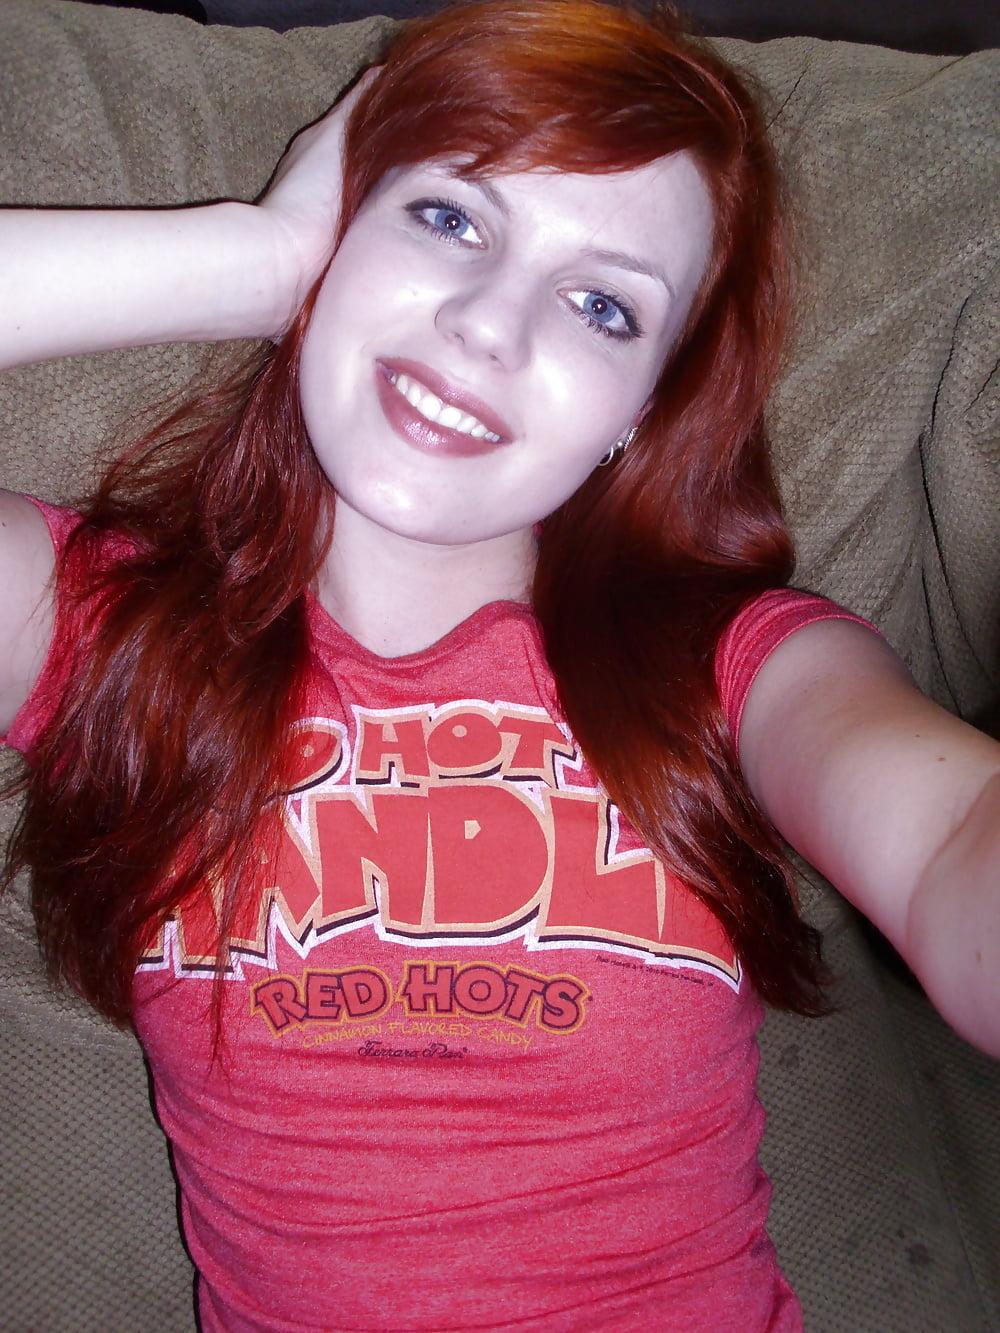 neket-real-redhead-girlfriends-vagina